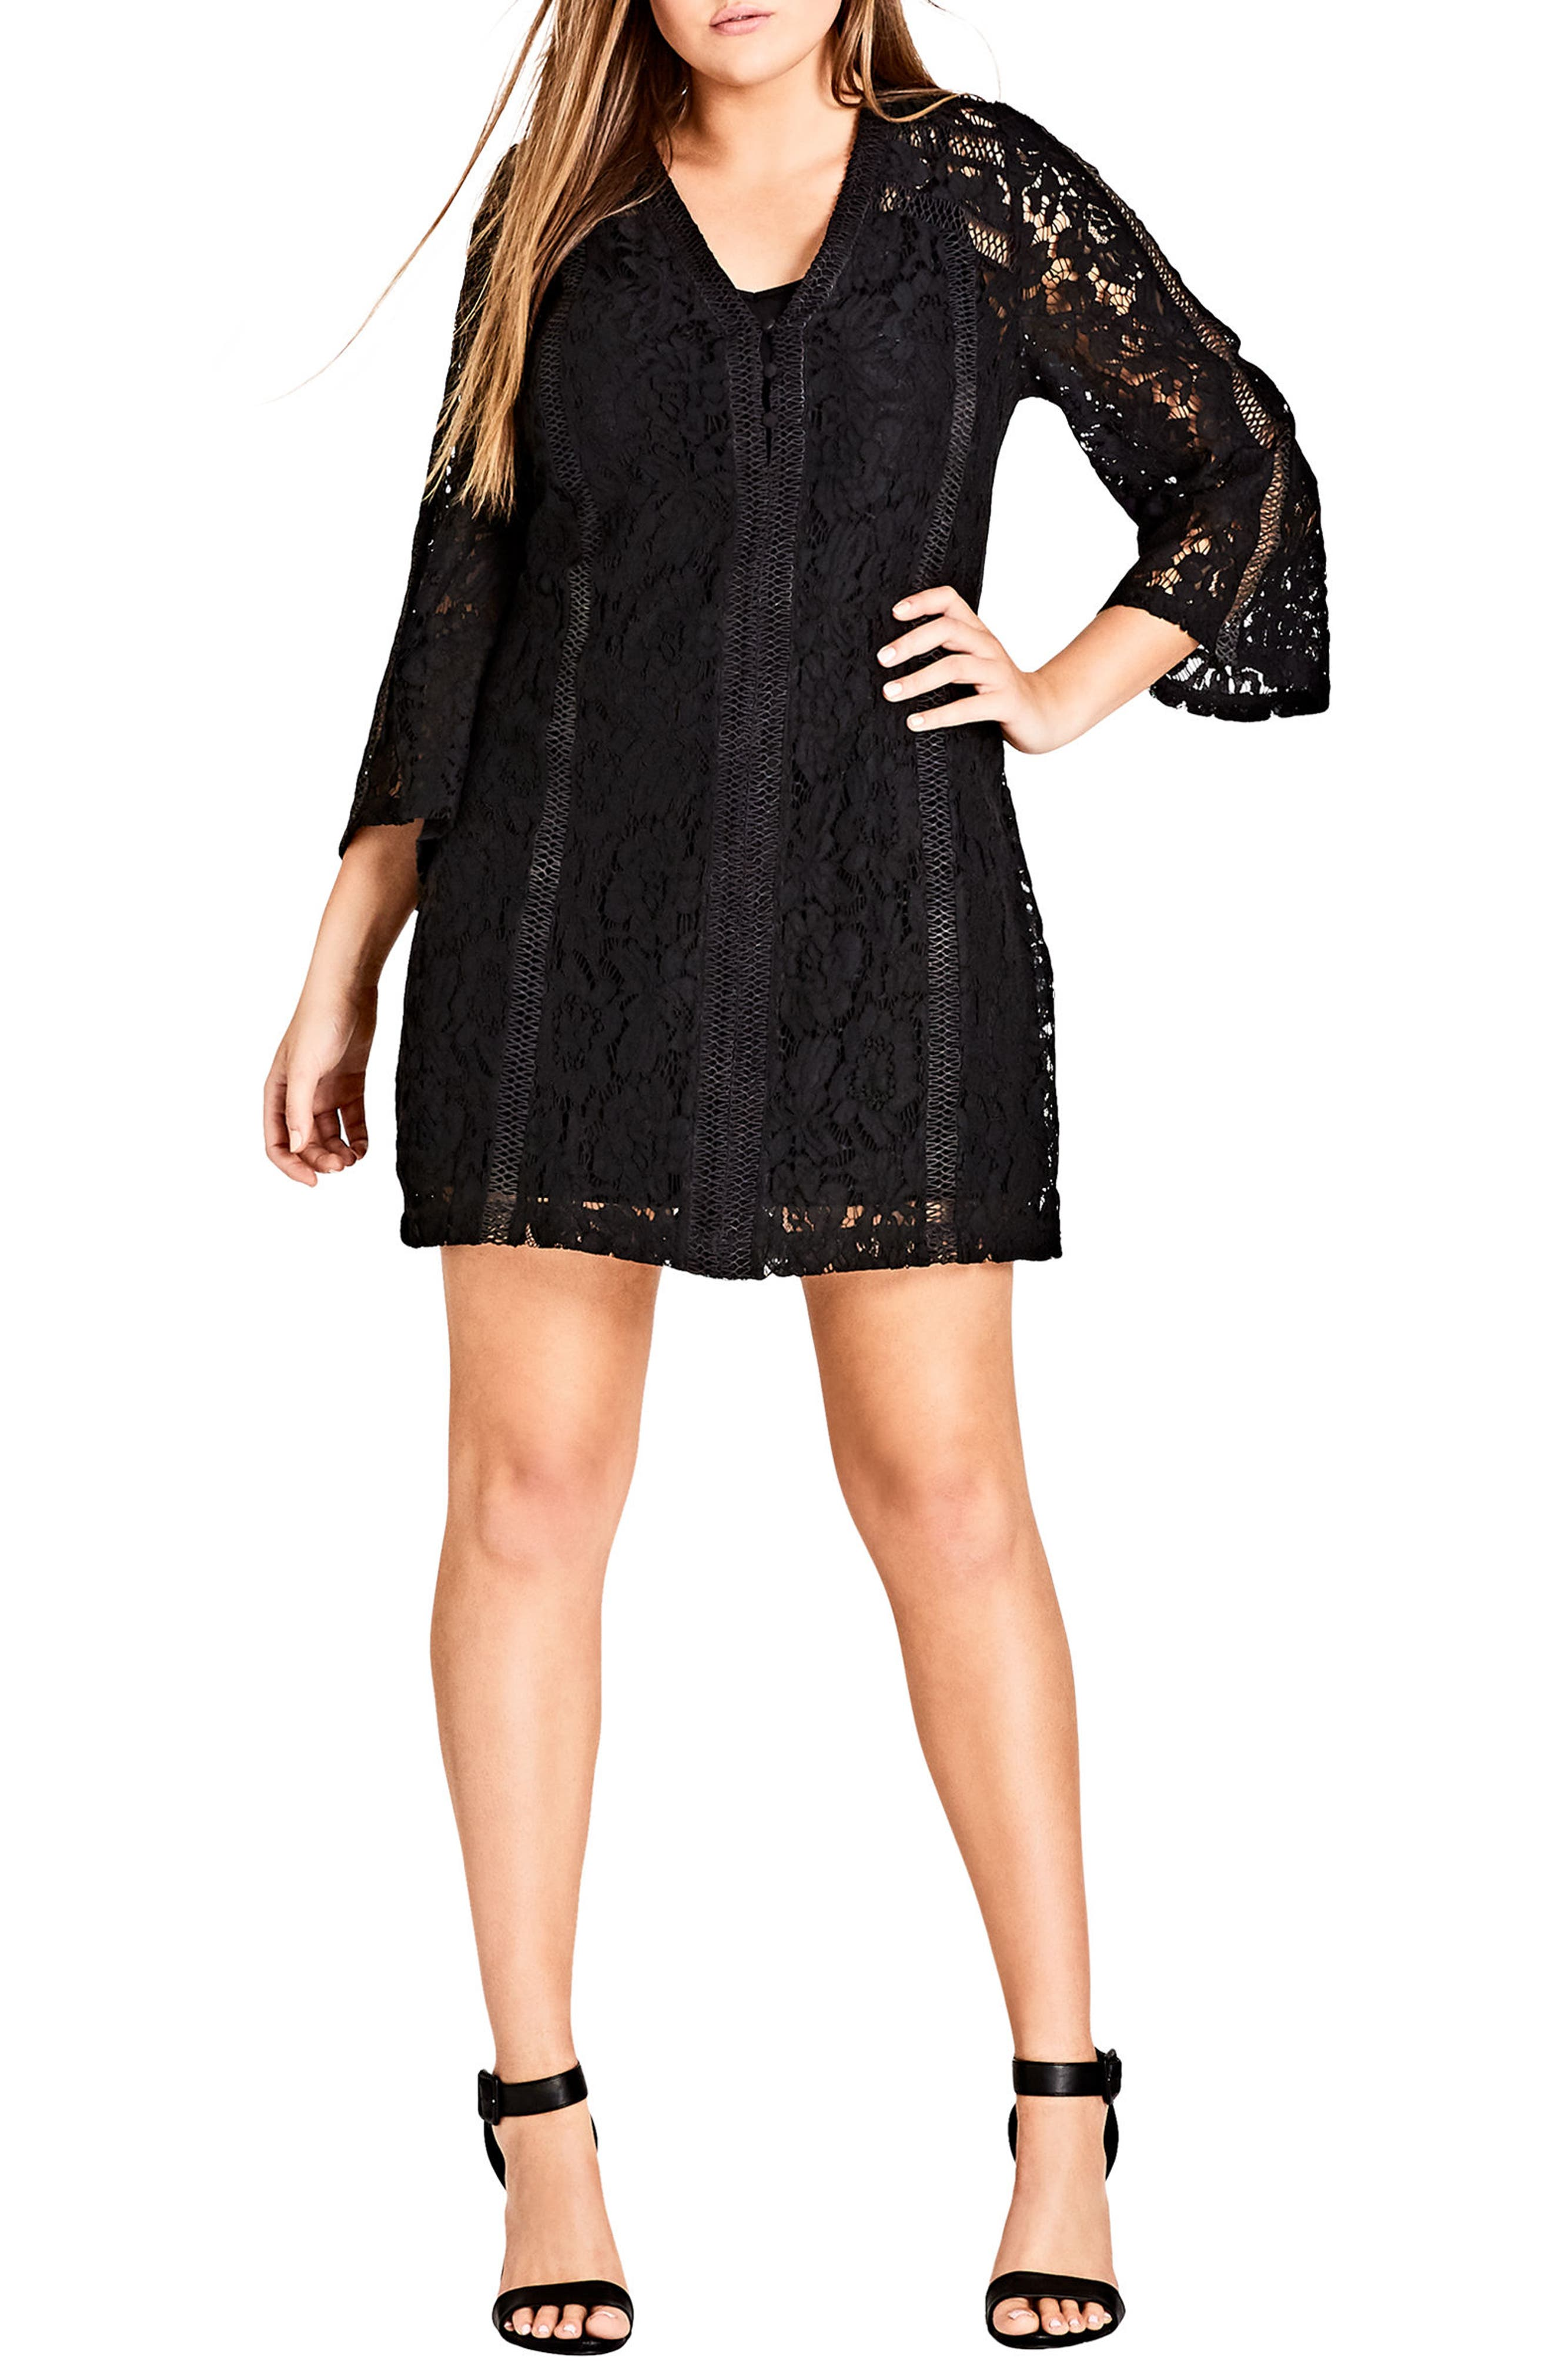 Innocent Lace Shift Dress,                             Main thumbnail 1, color,                             BLACK